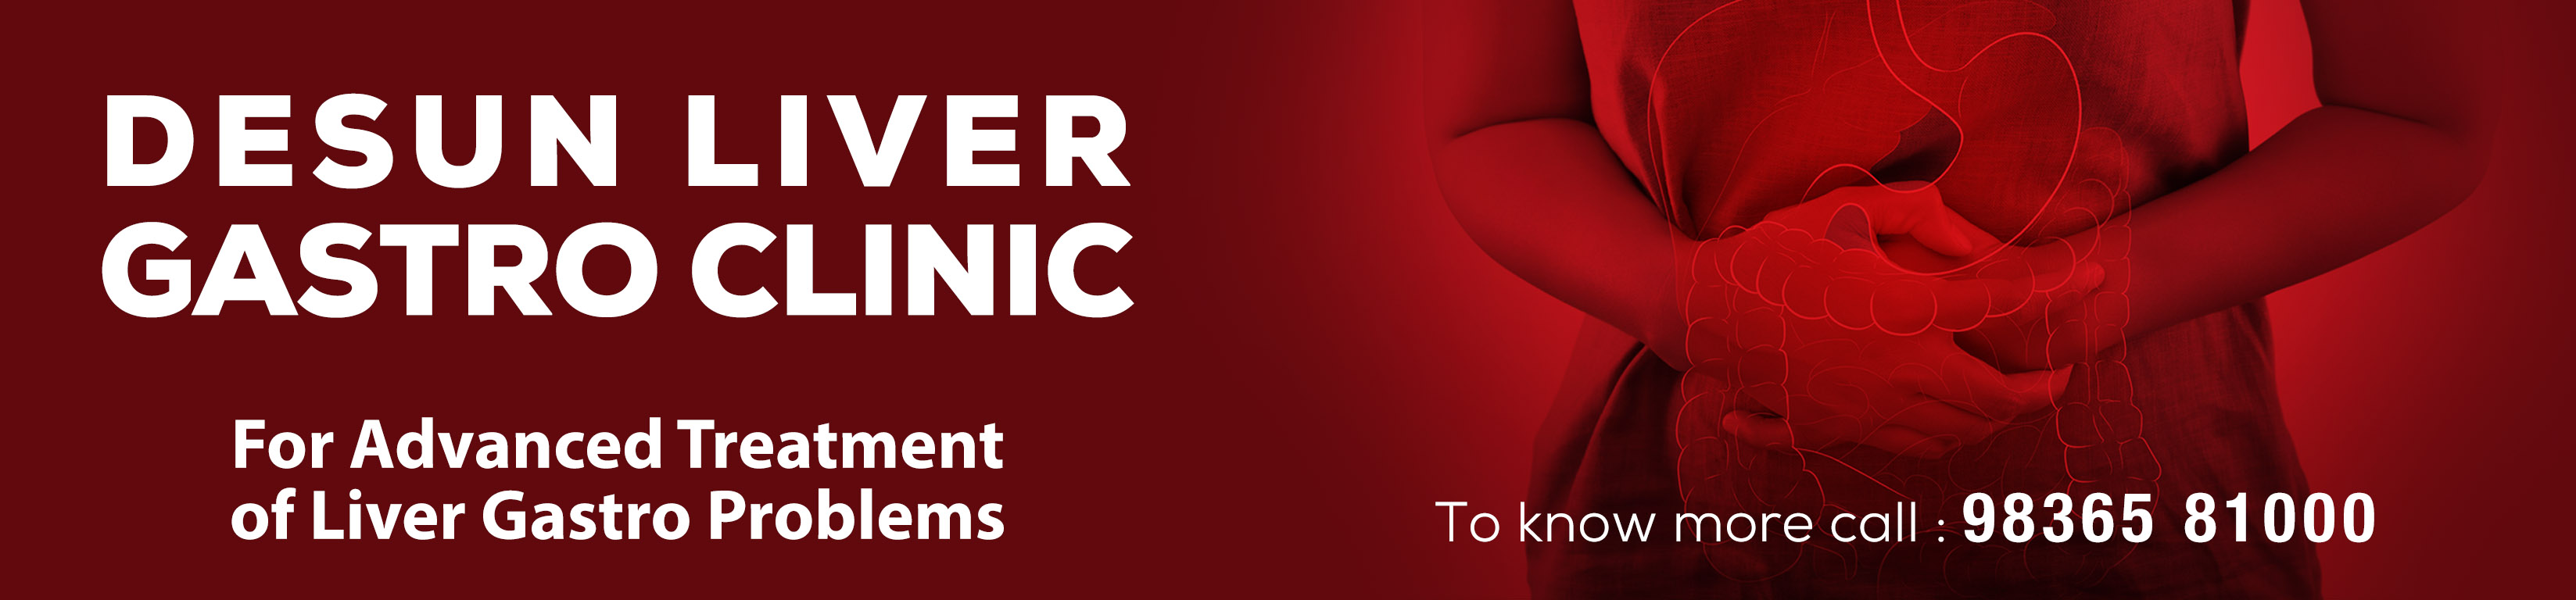 liver gastro clinic banner